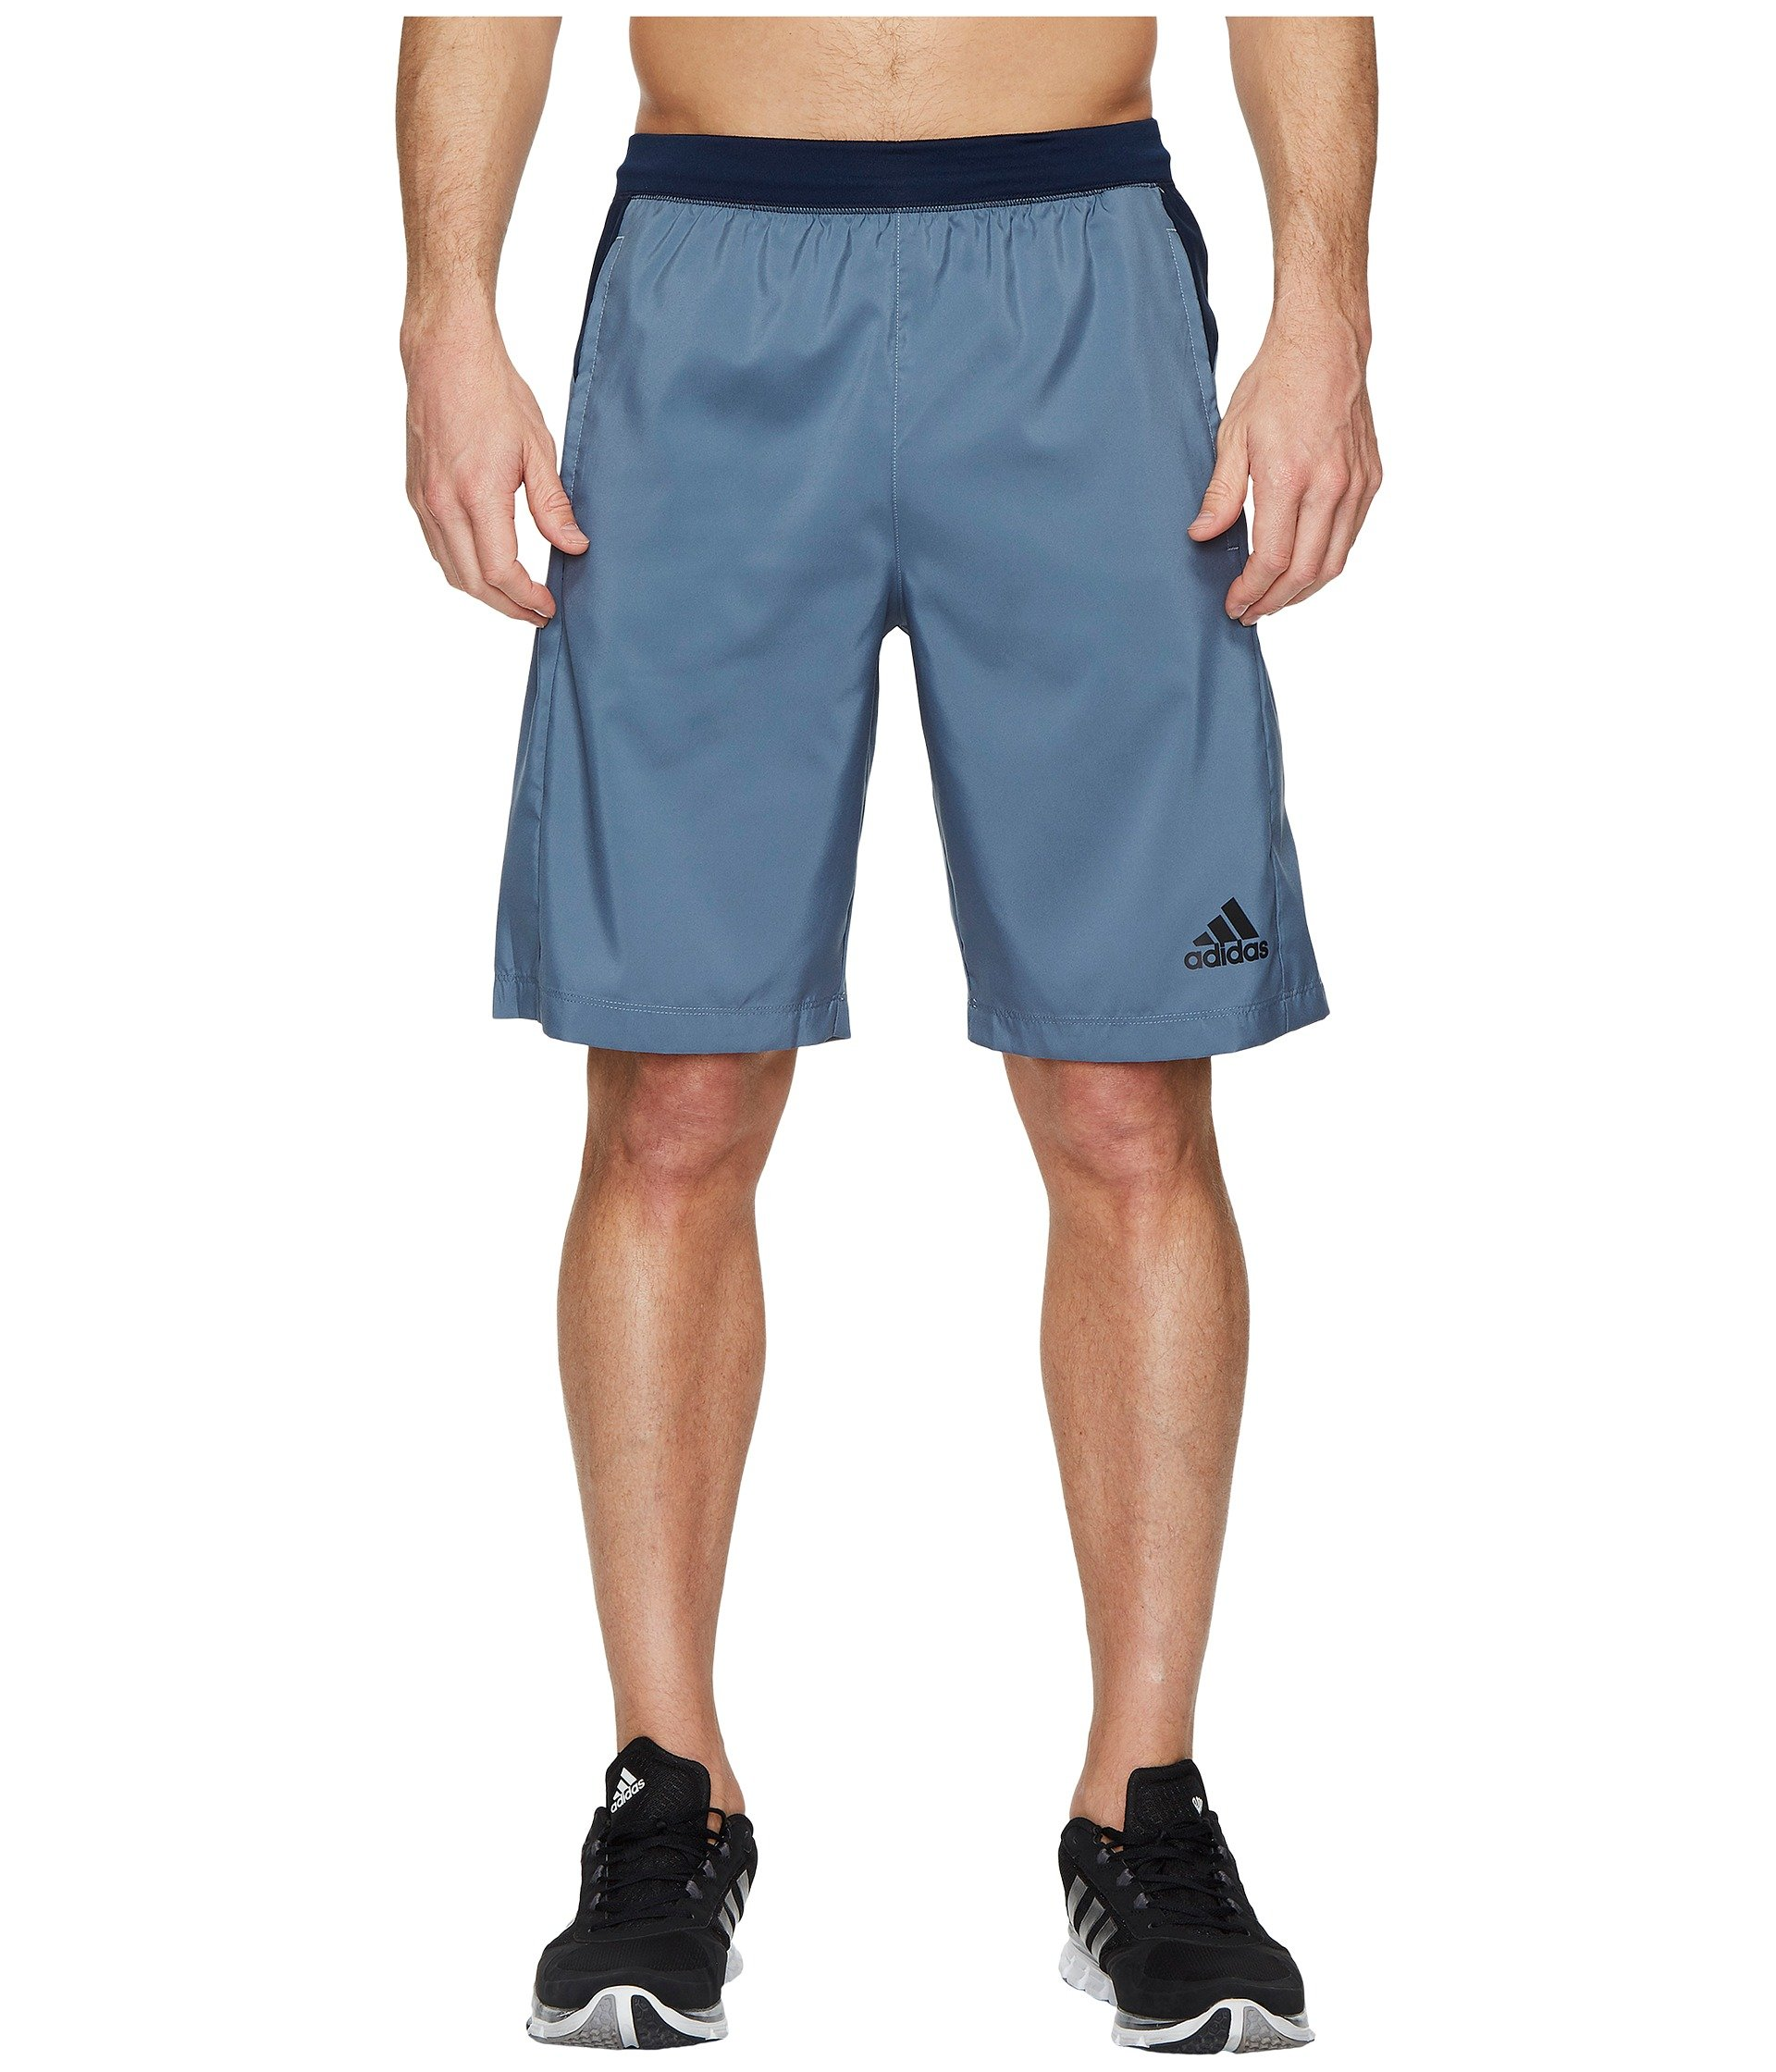 adidas Men's Designed-2-Move Shorts, Raw